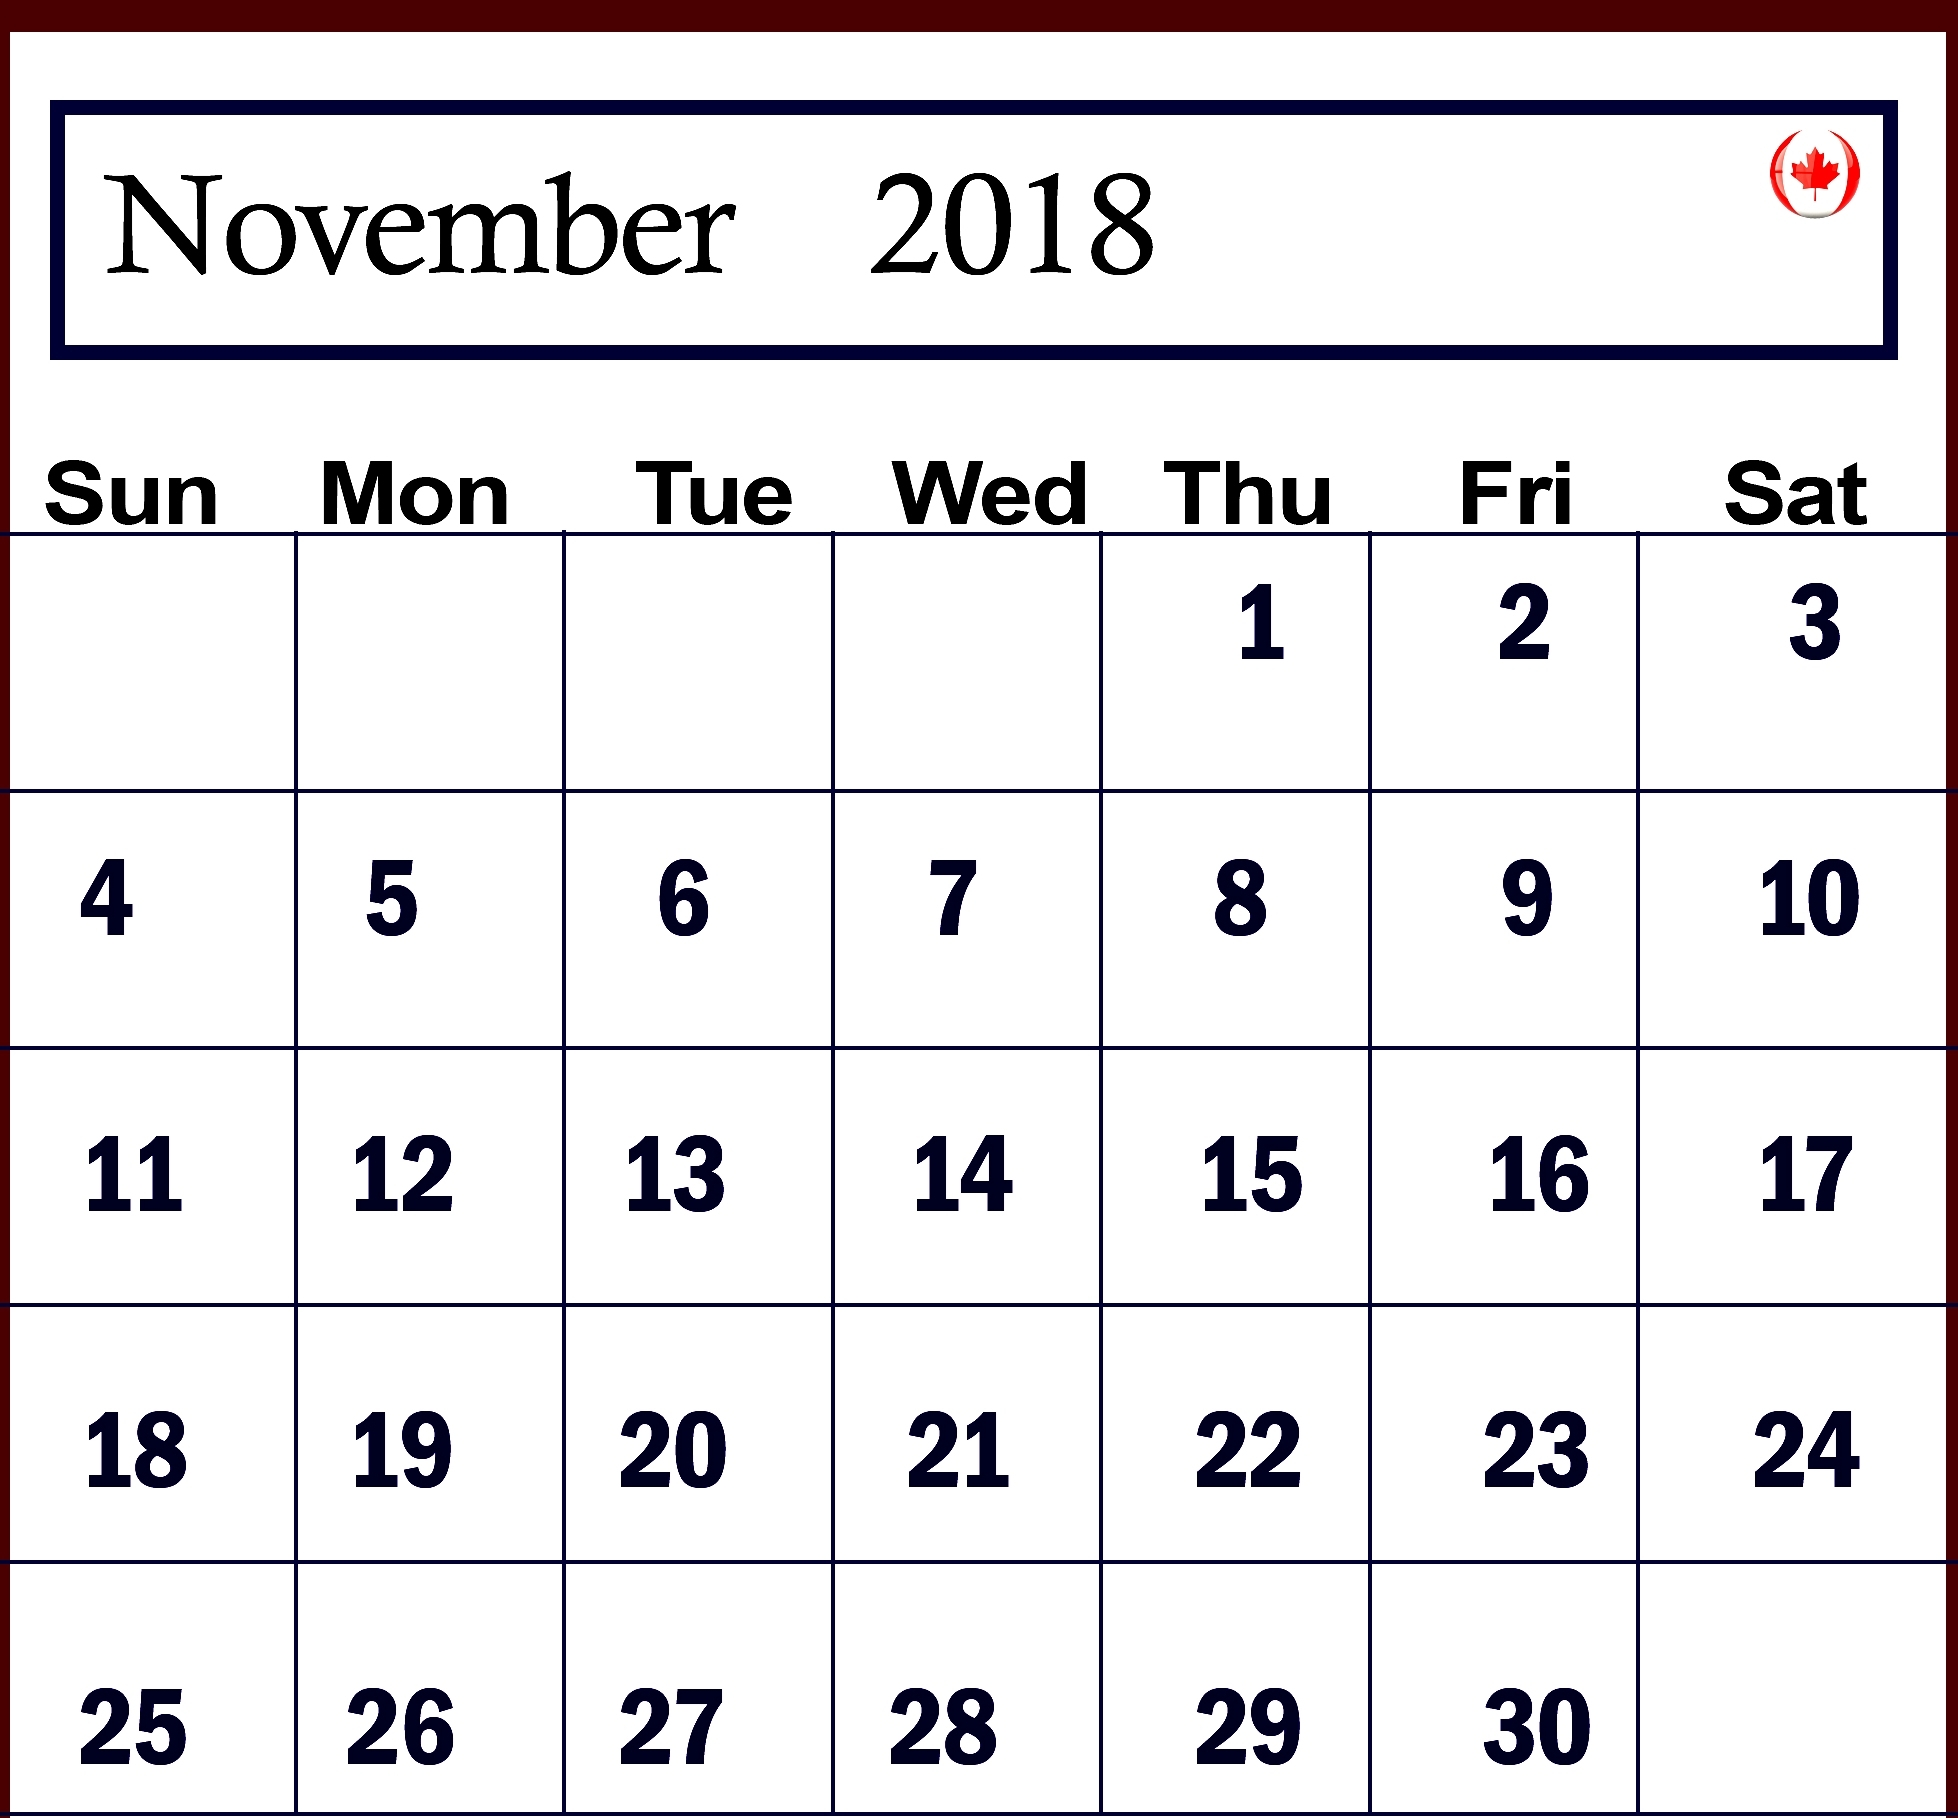 november 2018 calendar canada best calendar printable pdf::November 2018 Calendar Pdf